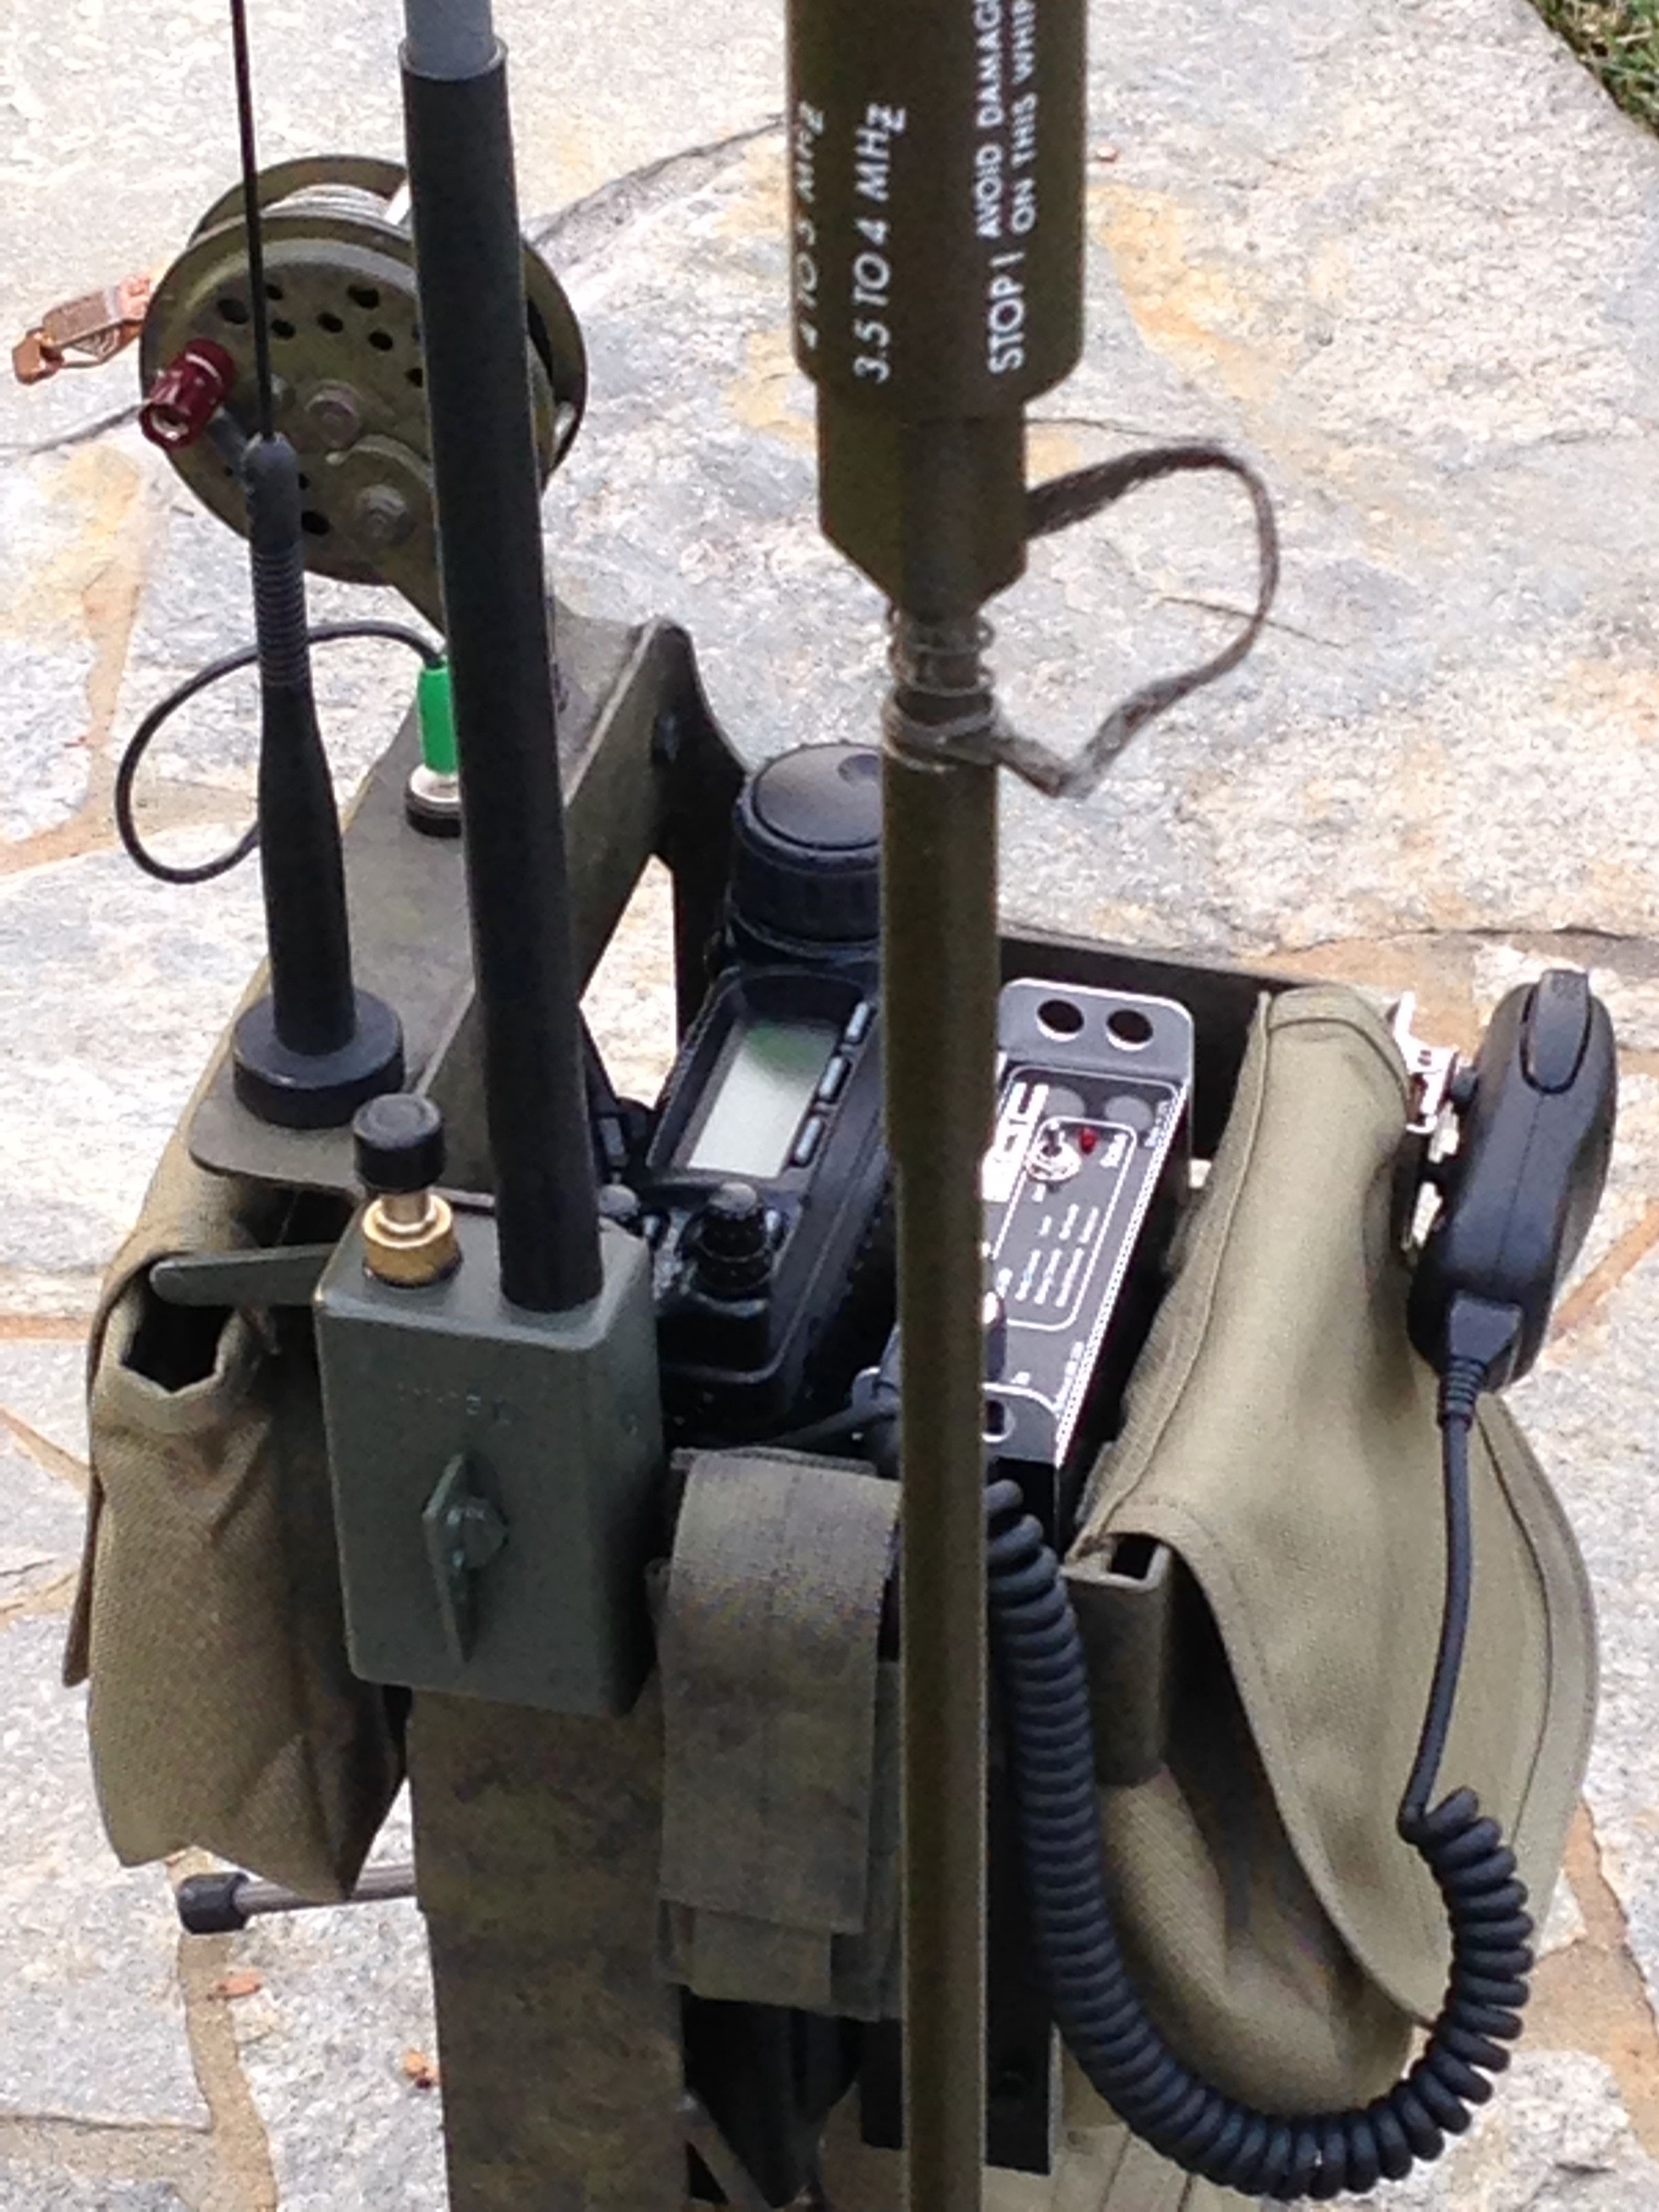 HF Manpack By: N6VOA | Ham | Ham radio equipment, Ham radio